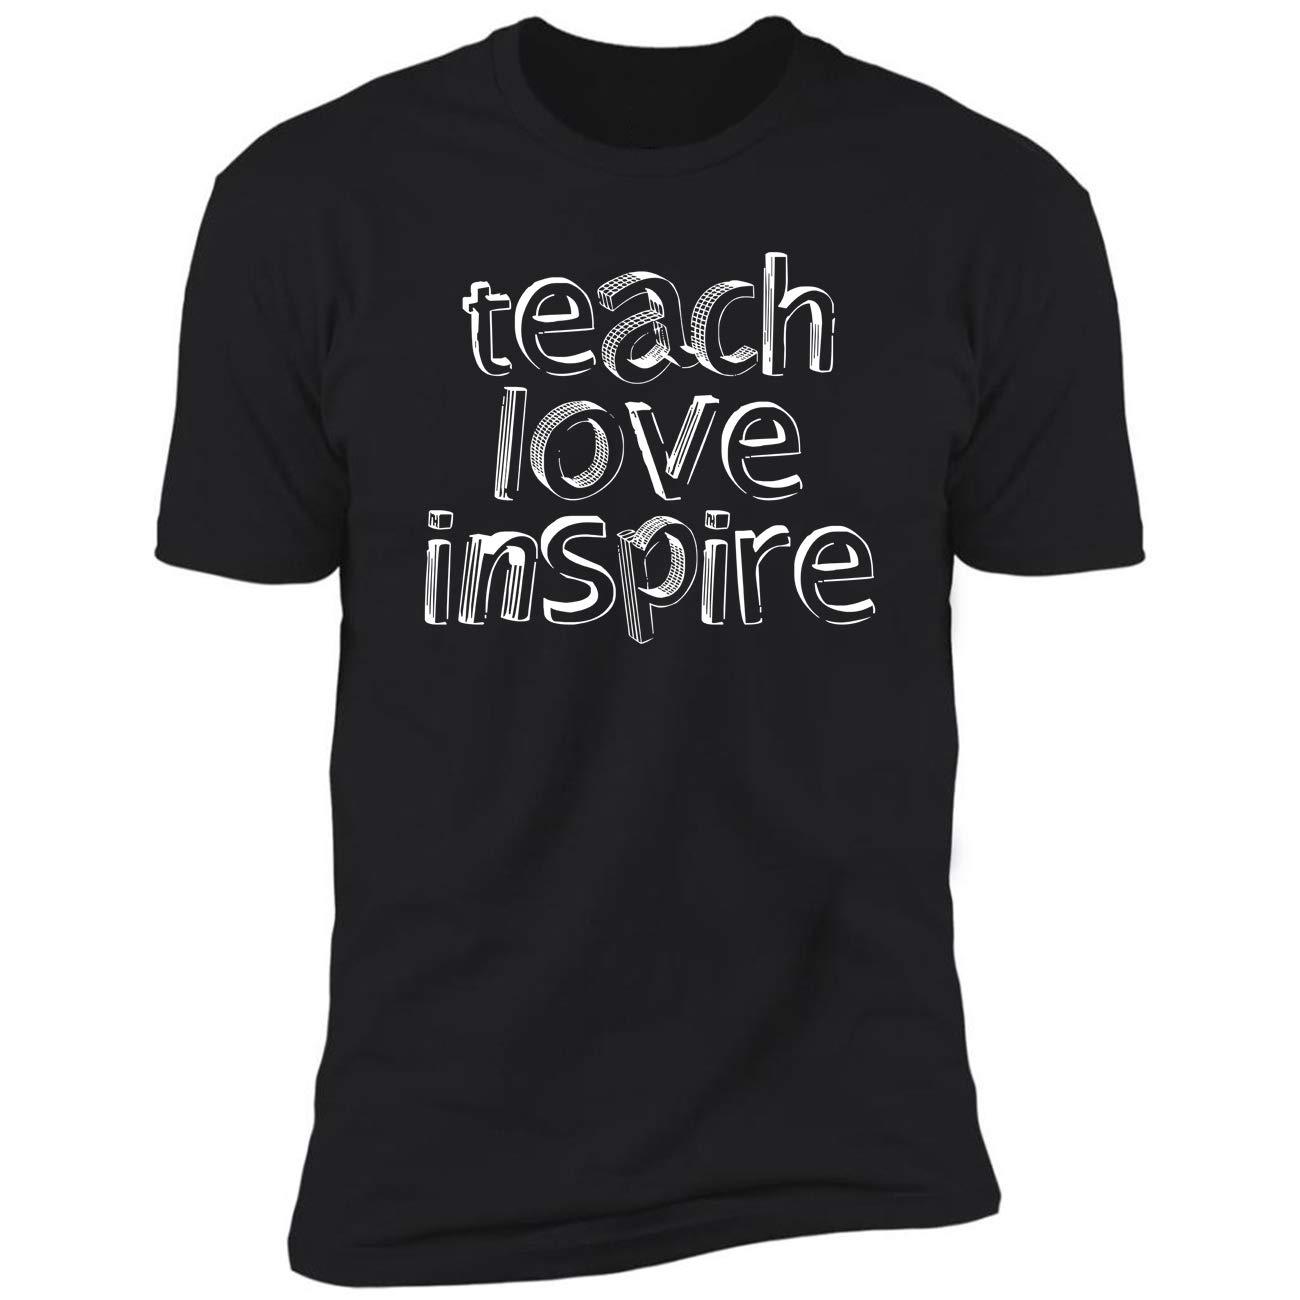 Teach Love Inspiremeaningful Tea Giftsbirthday Presents Ted Tshirt